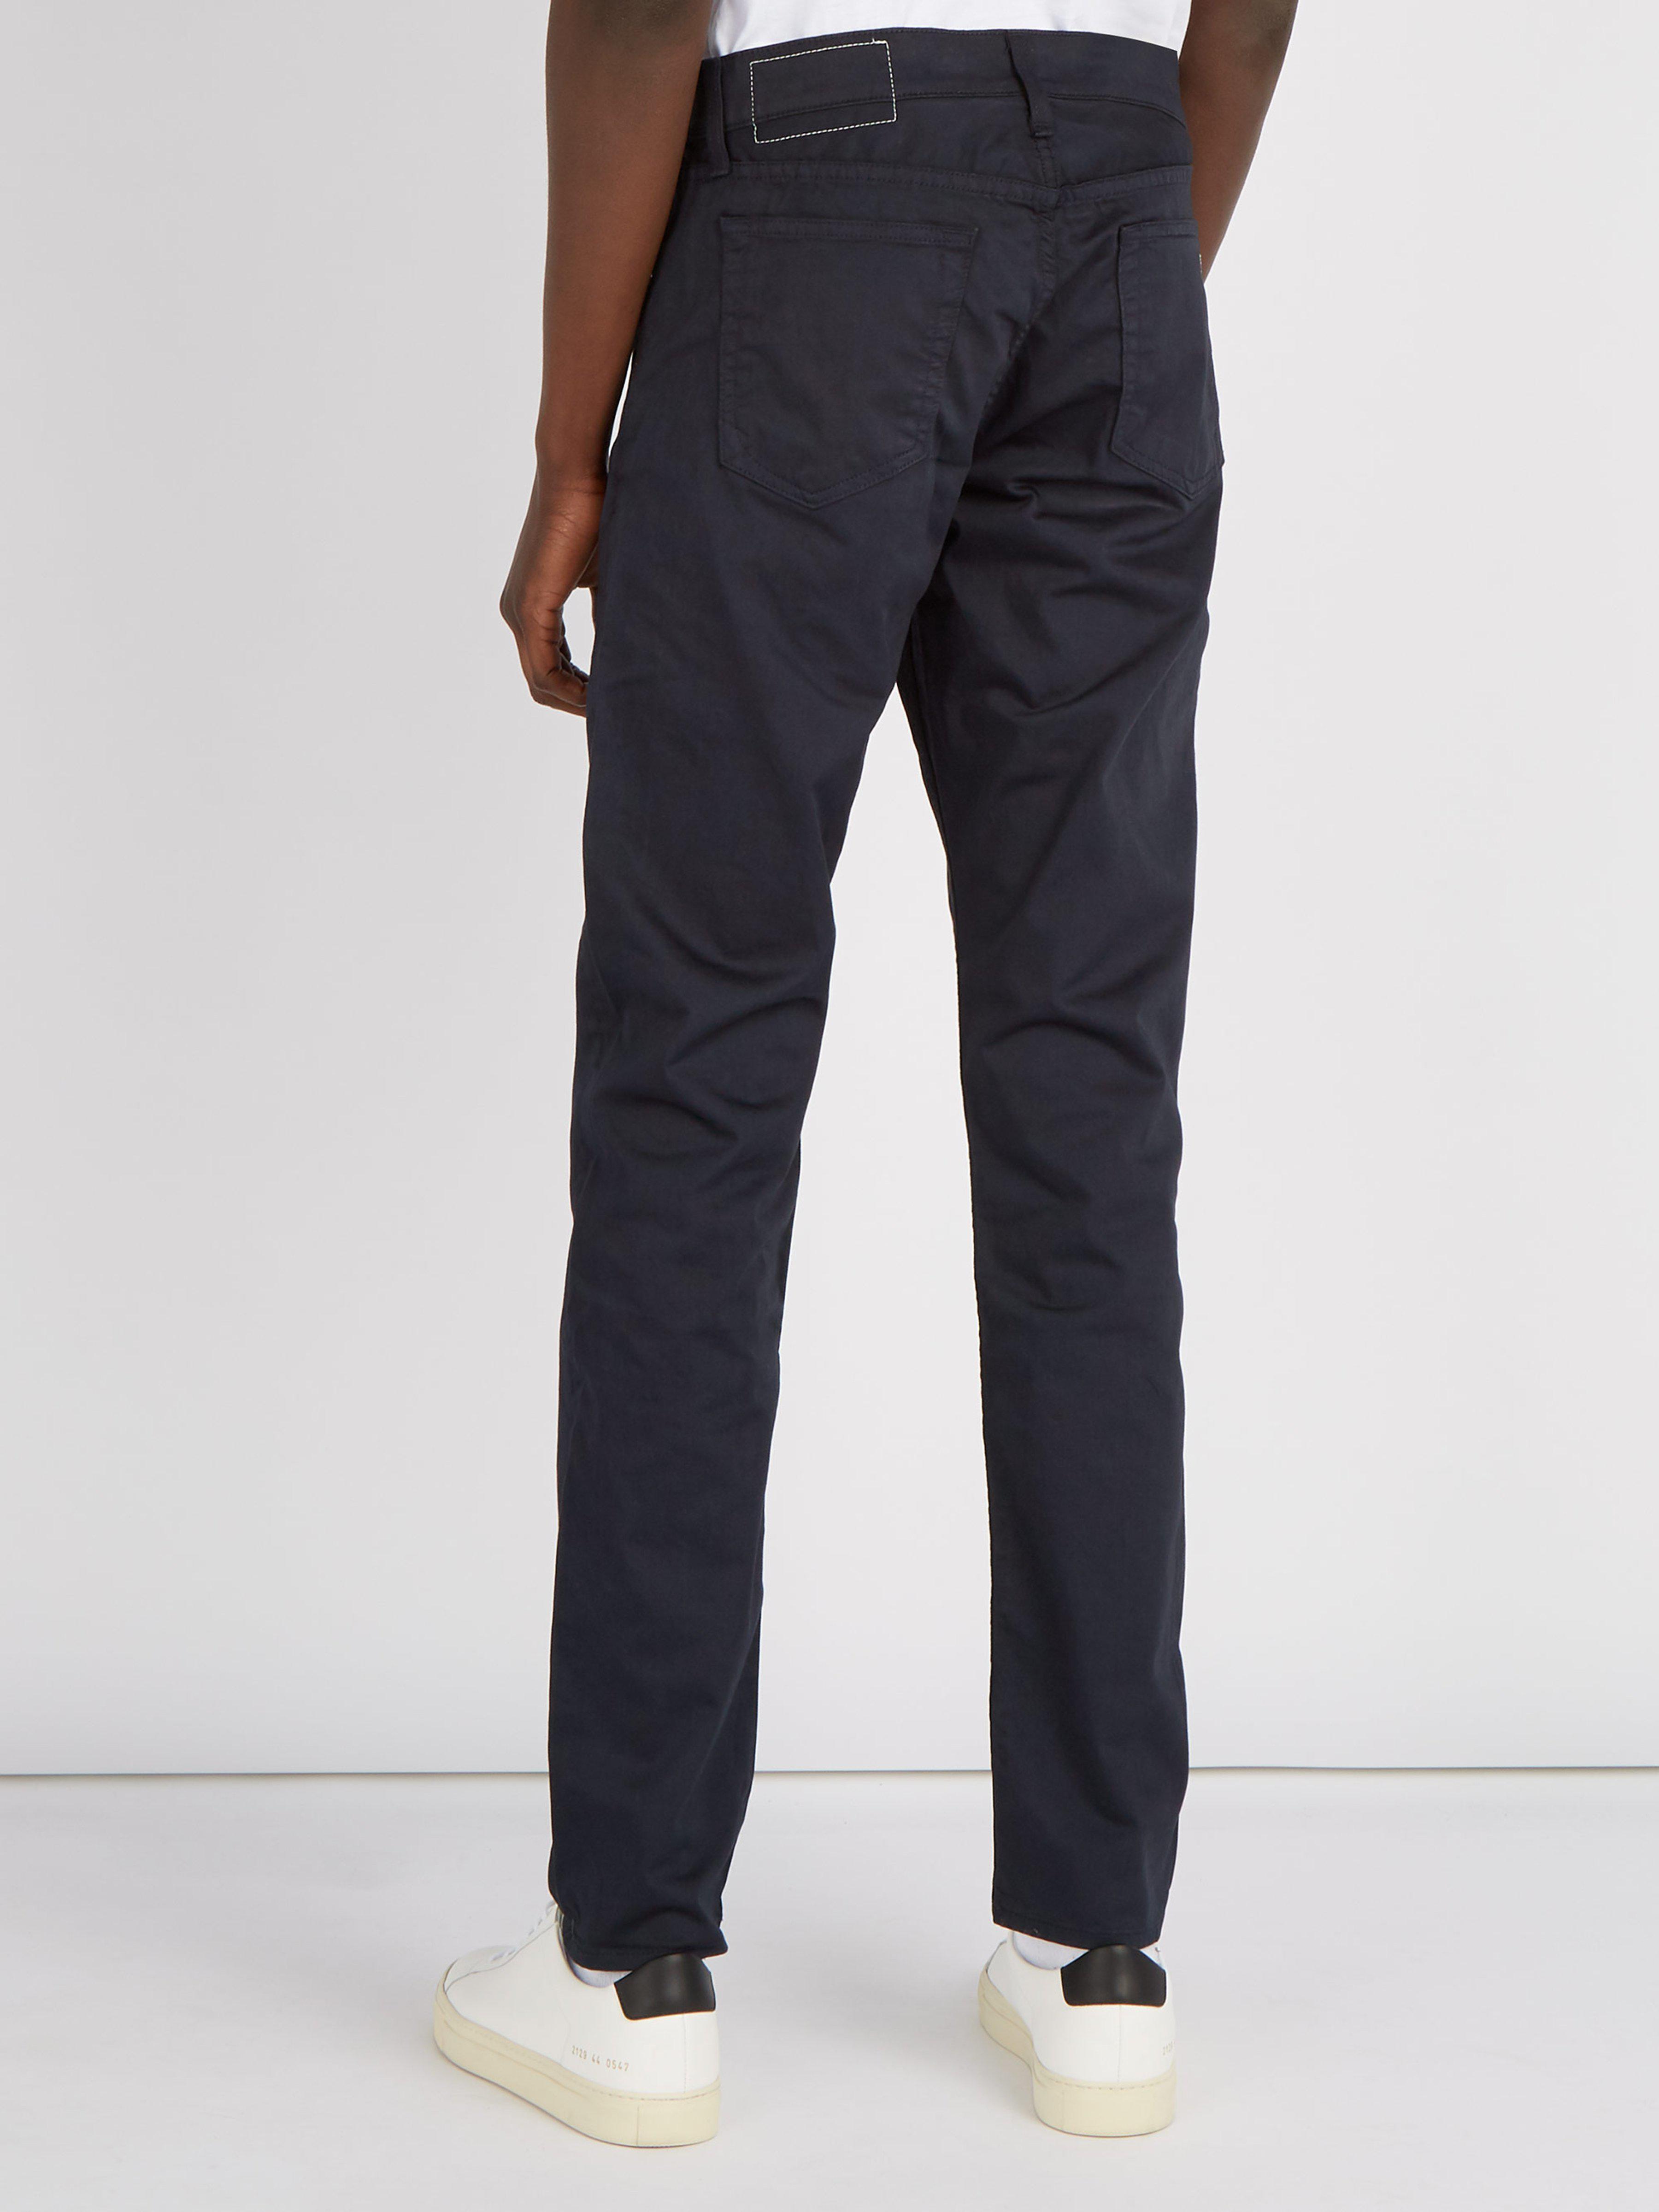 Rag & Bone Cotton Mid Rise Slim Leg Chino Trousers in Navy (Blue) for Men